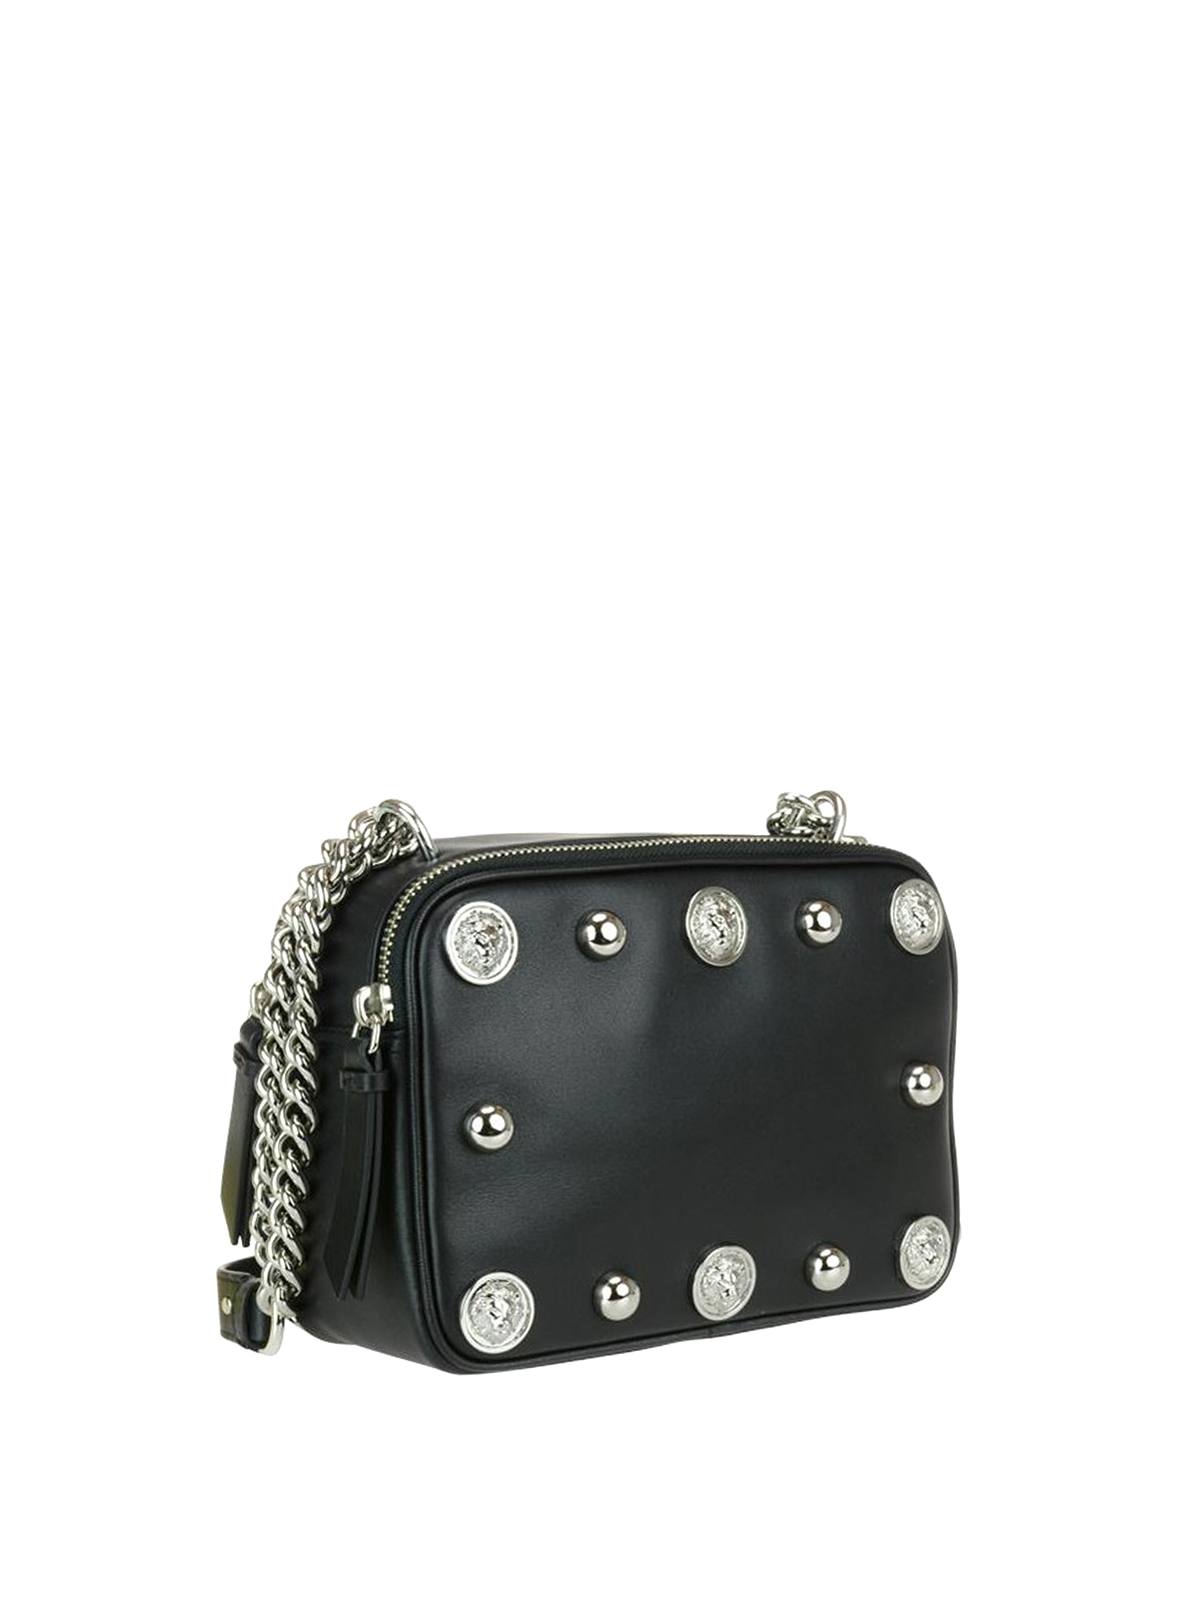 Versus Versace  cross body bags online - Lion Head studded leather bag bd87ac1338460